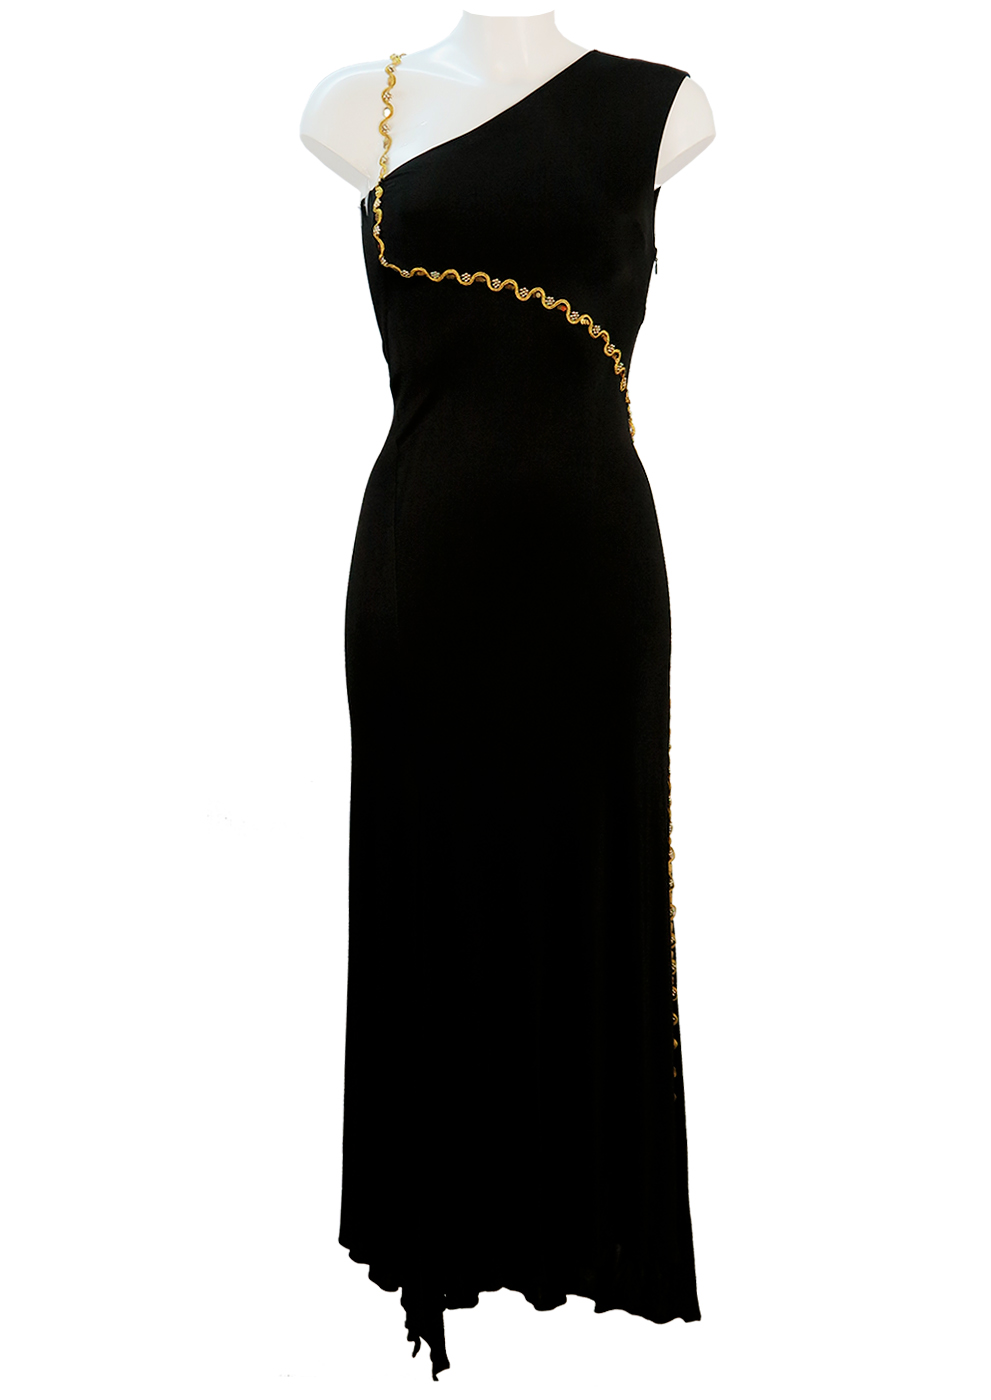 e59bd81c52 Max Mara Long Black Evening Dress with Gold Strap Detail   Side Split ...